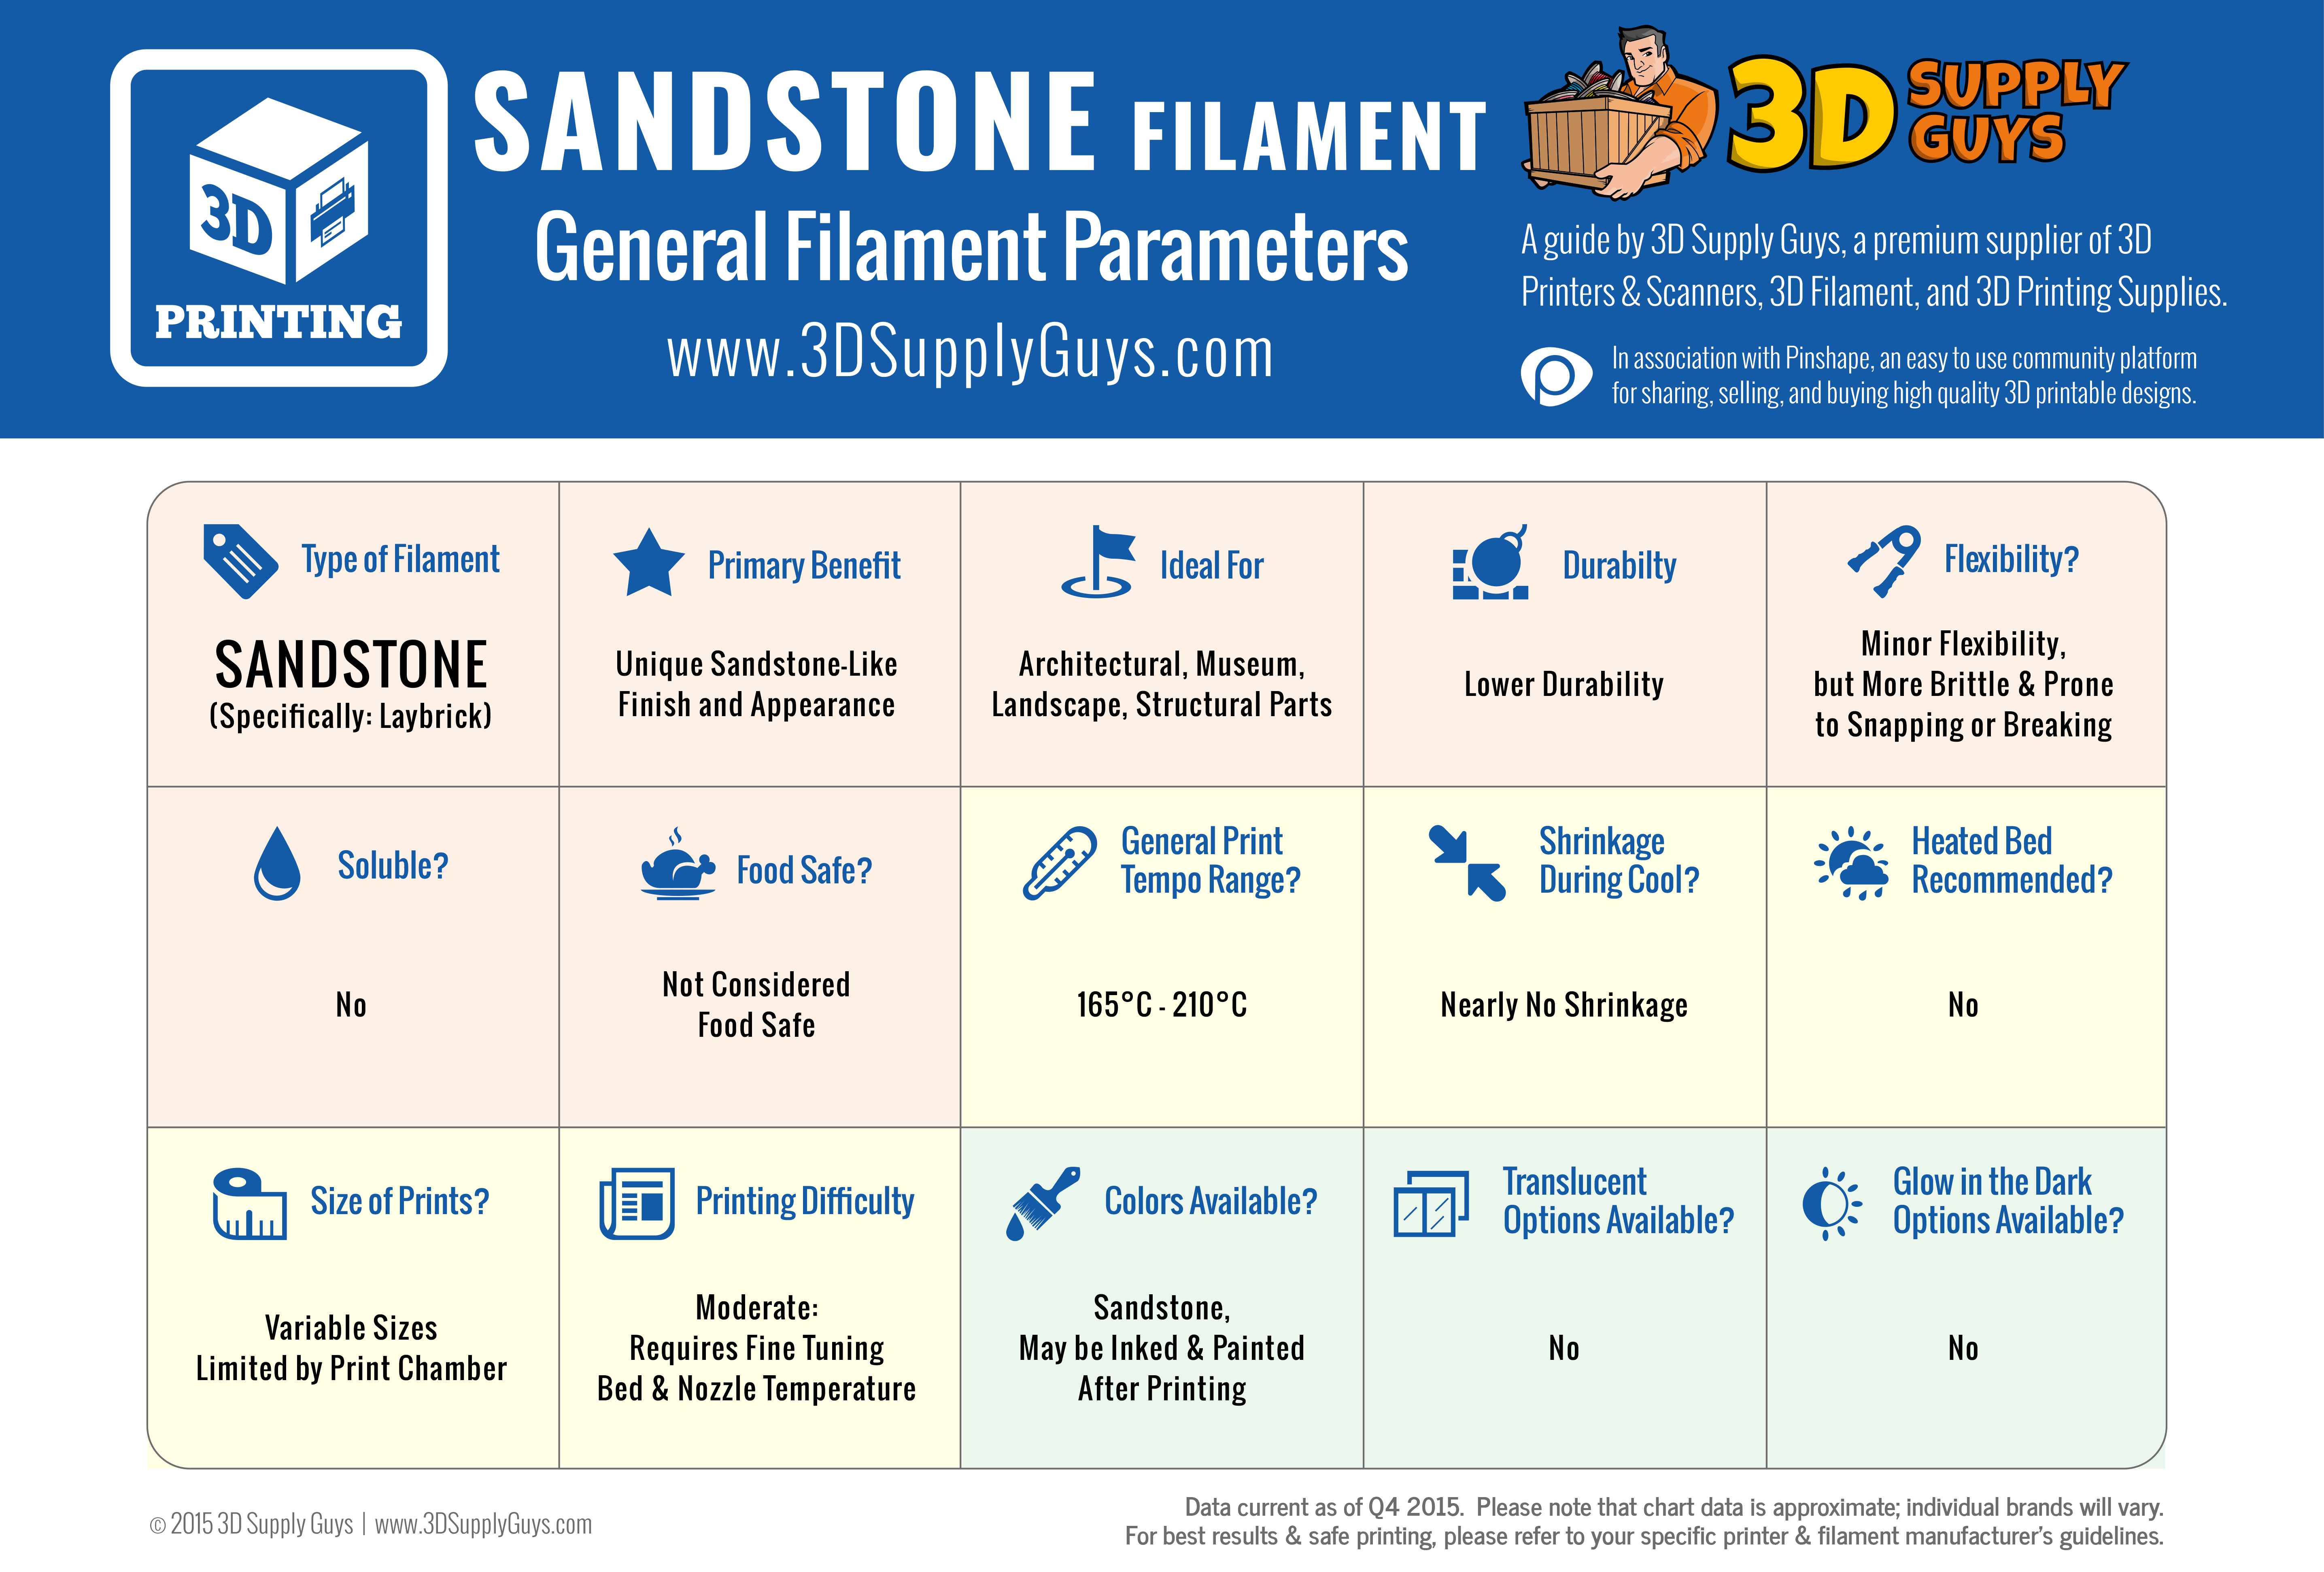 3DSupplyGuys_Filament-08_SANDSTONE